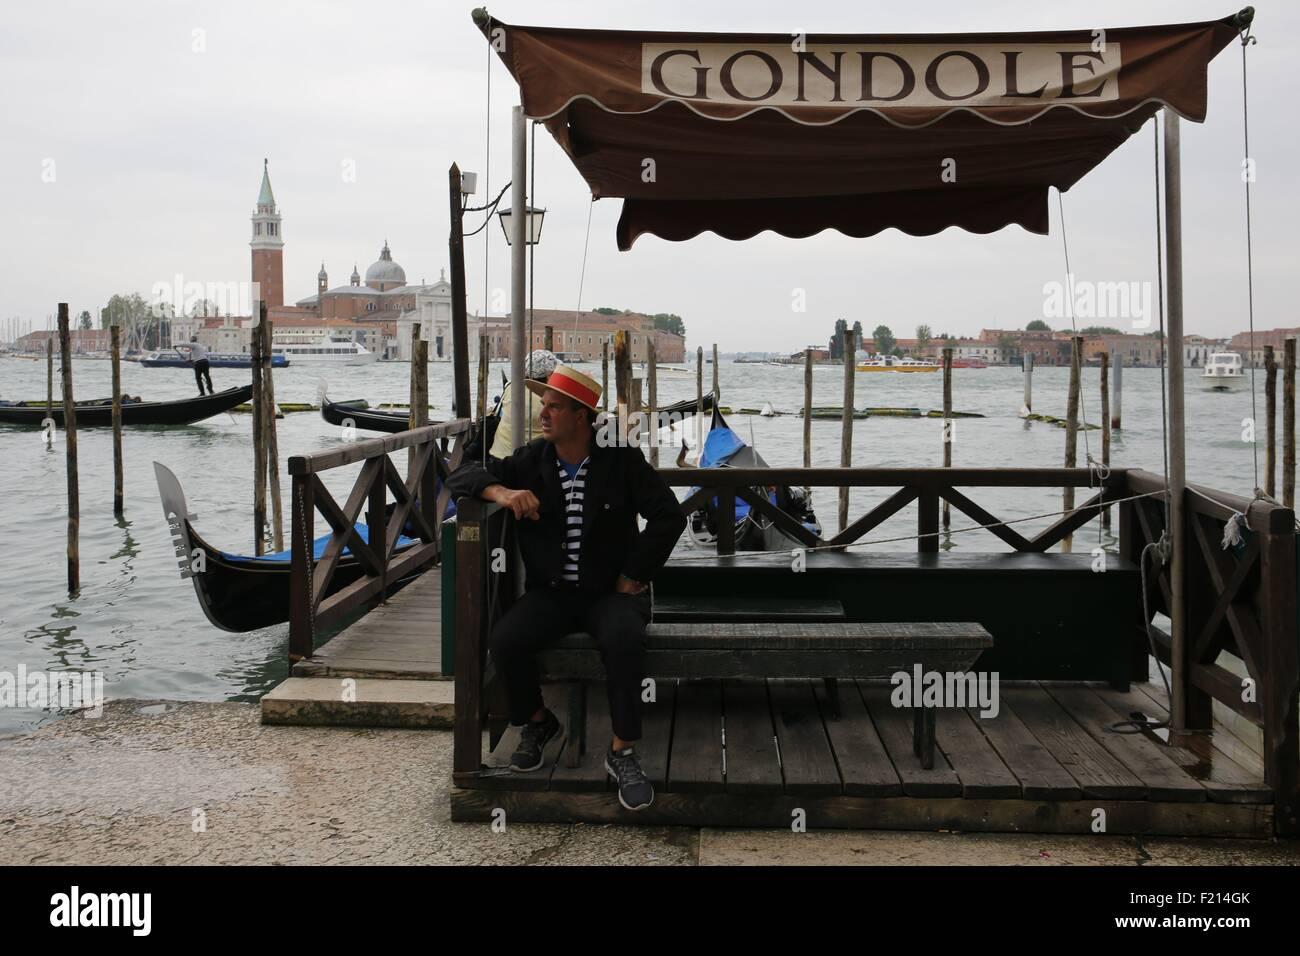 Italy, Venice, gondola sailor or gondolier - Stock Image